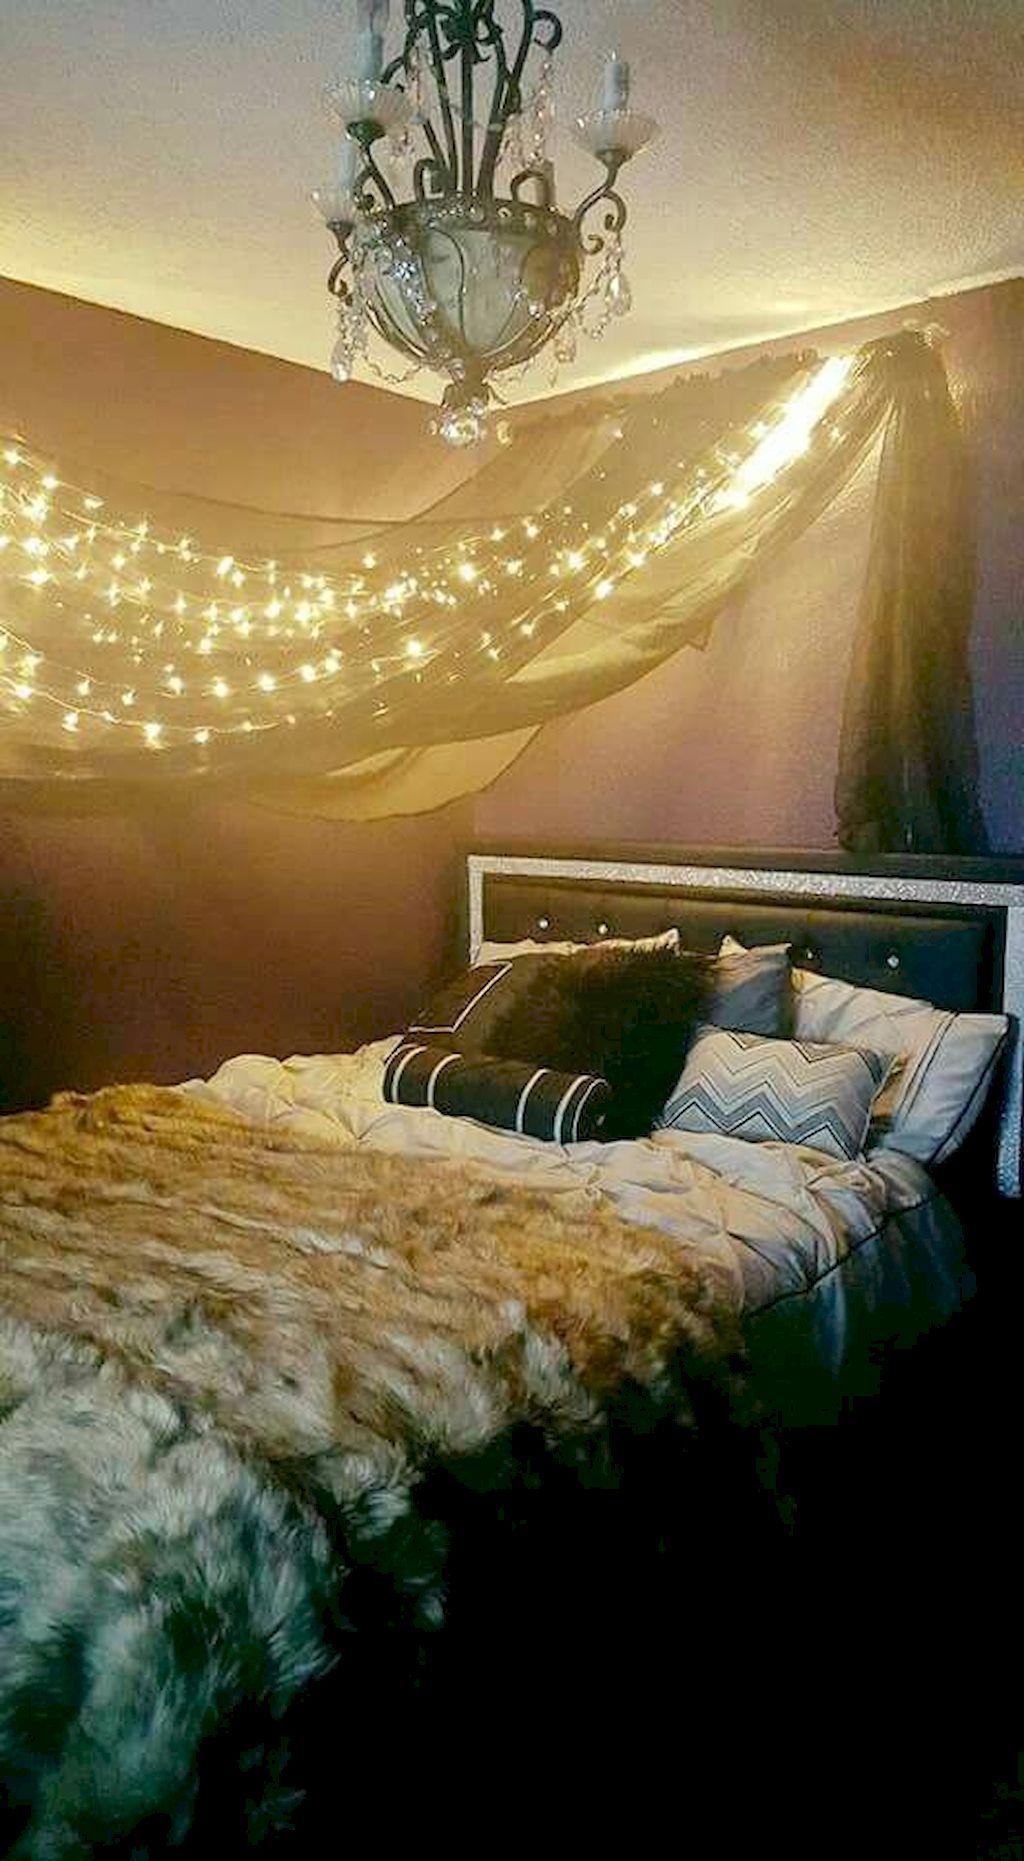 Bedroom Decoration Ideas For Romantic Moment Home To Z Master Bedroom Lighting Fairy Lights Bedroom Goth Bedroom